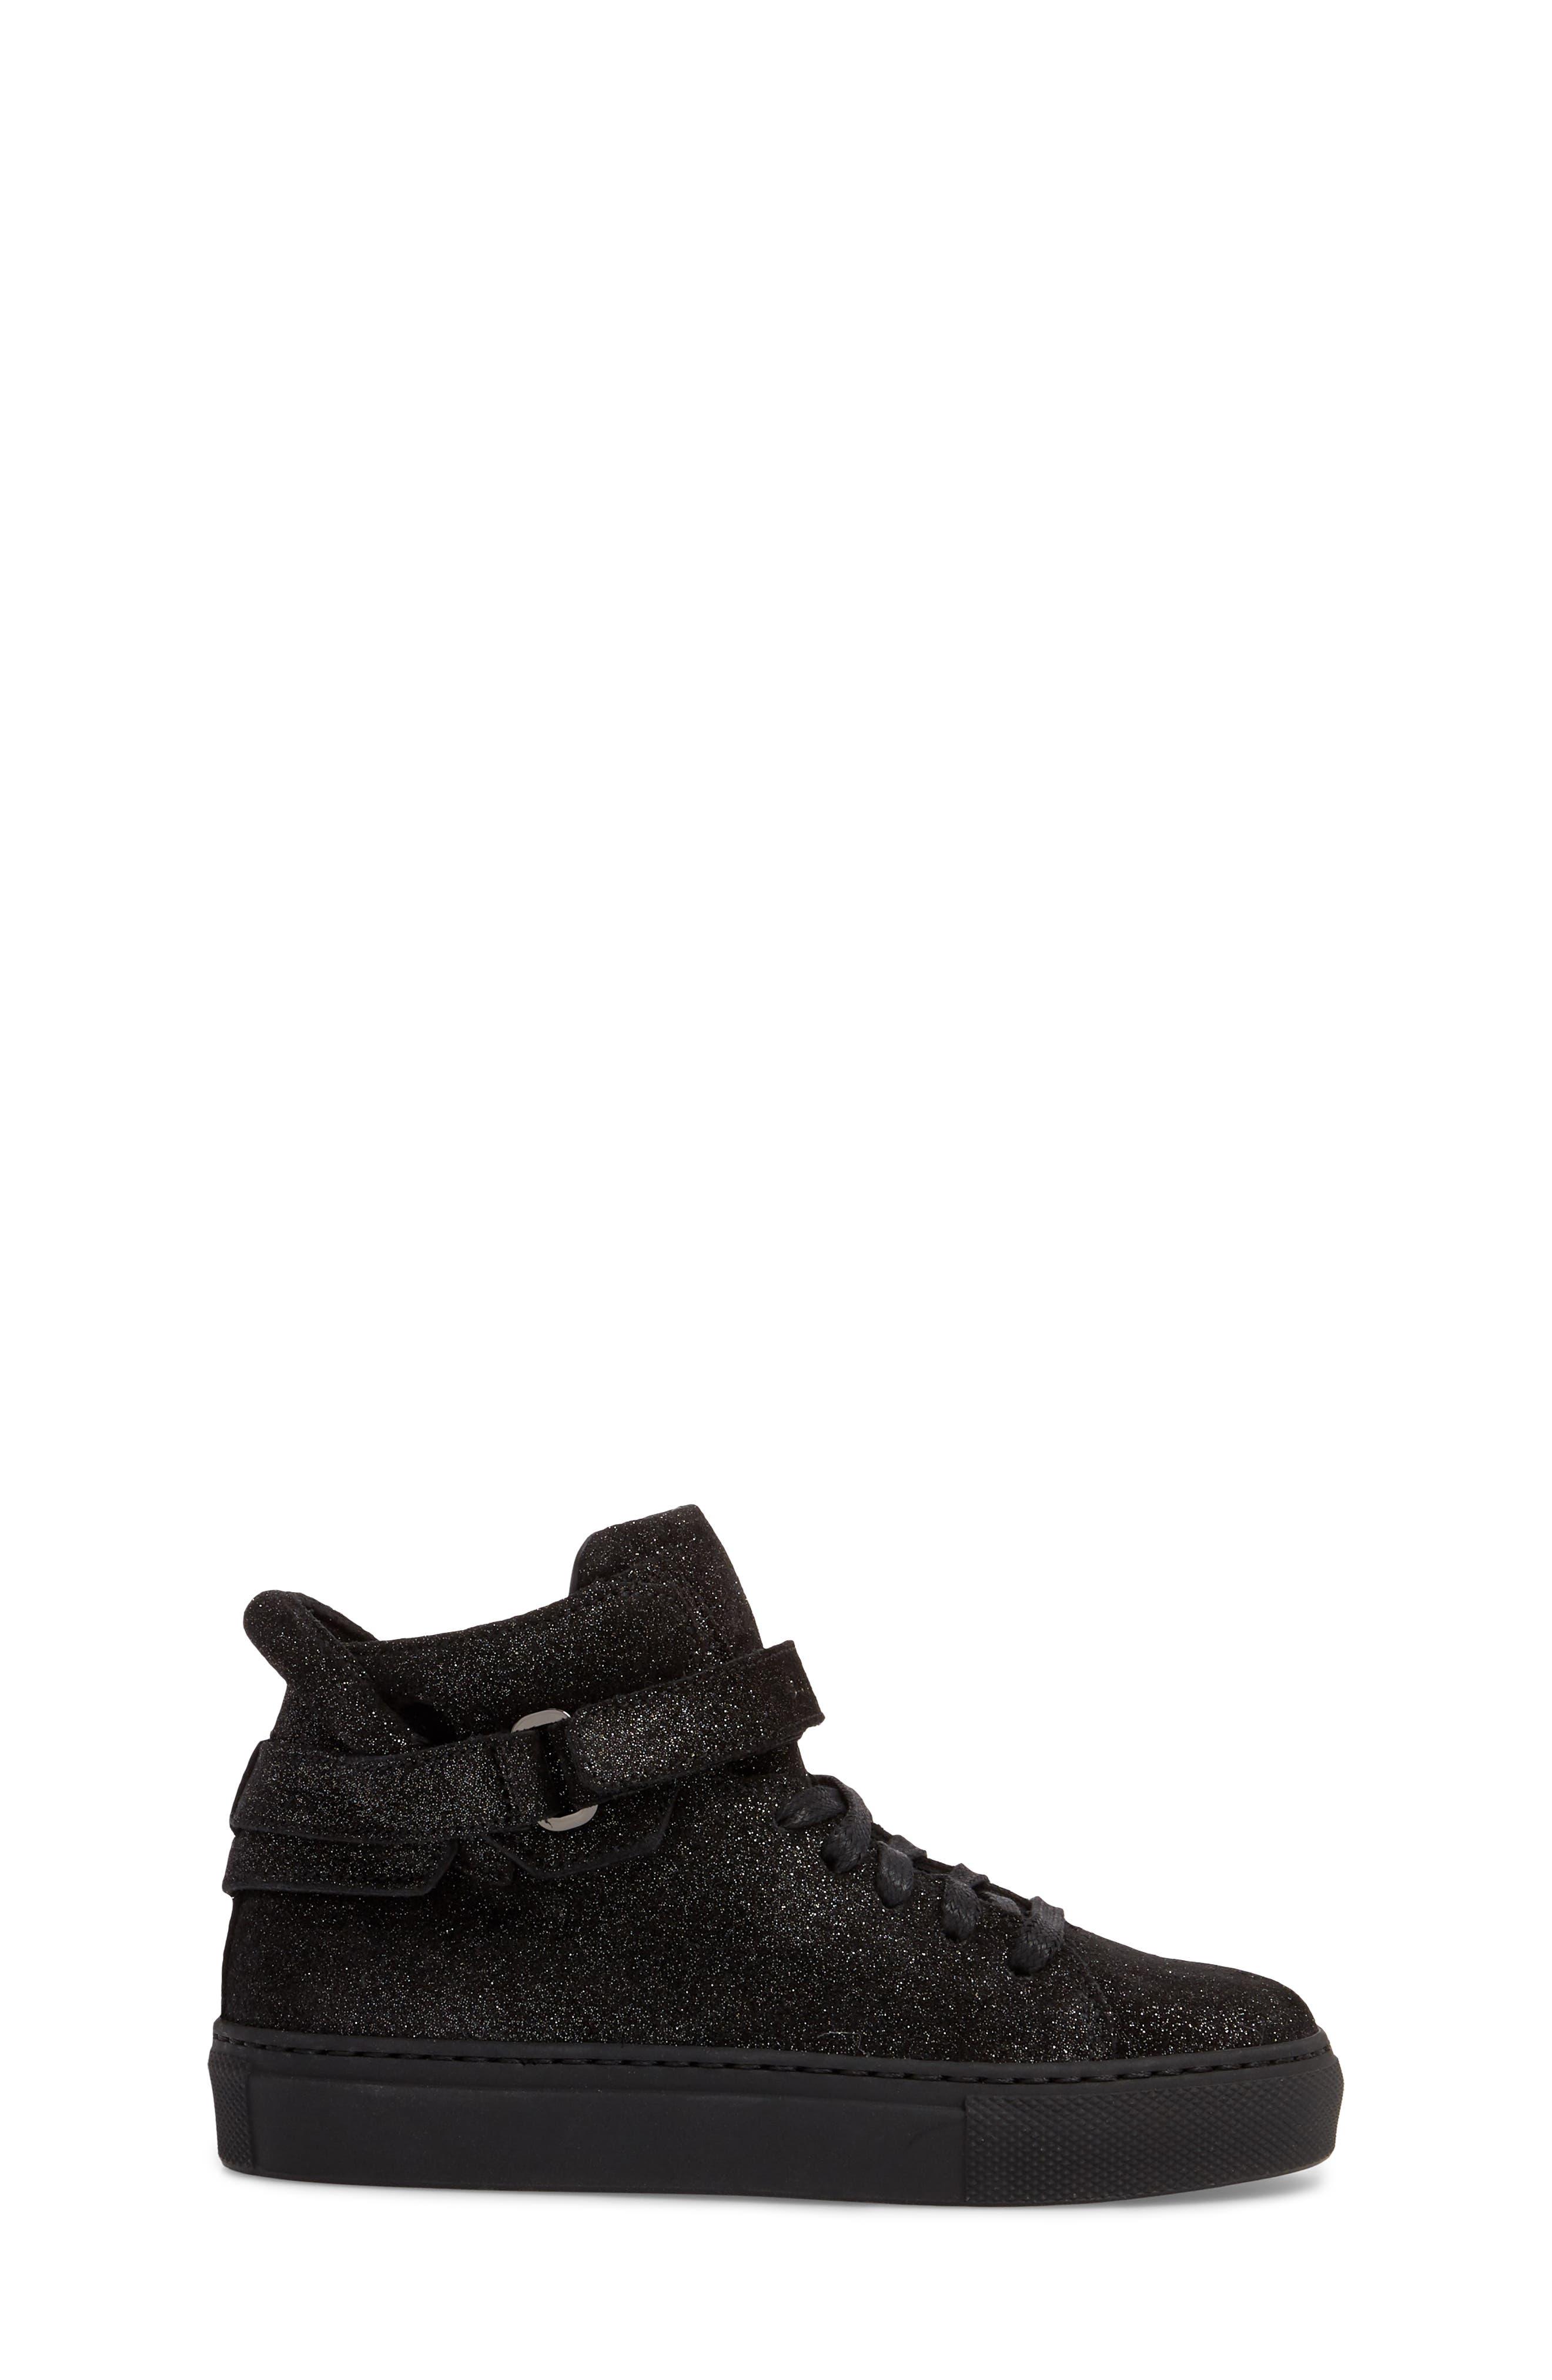 BUSCEMI,                             Gleam High Top Sneaker,                             Alternate thumbnail 3, color,                             001